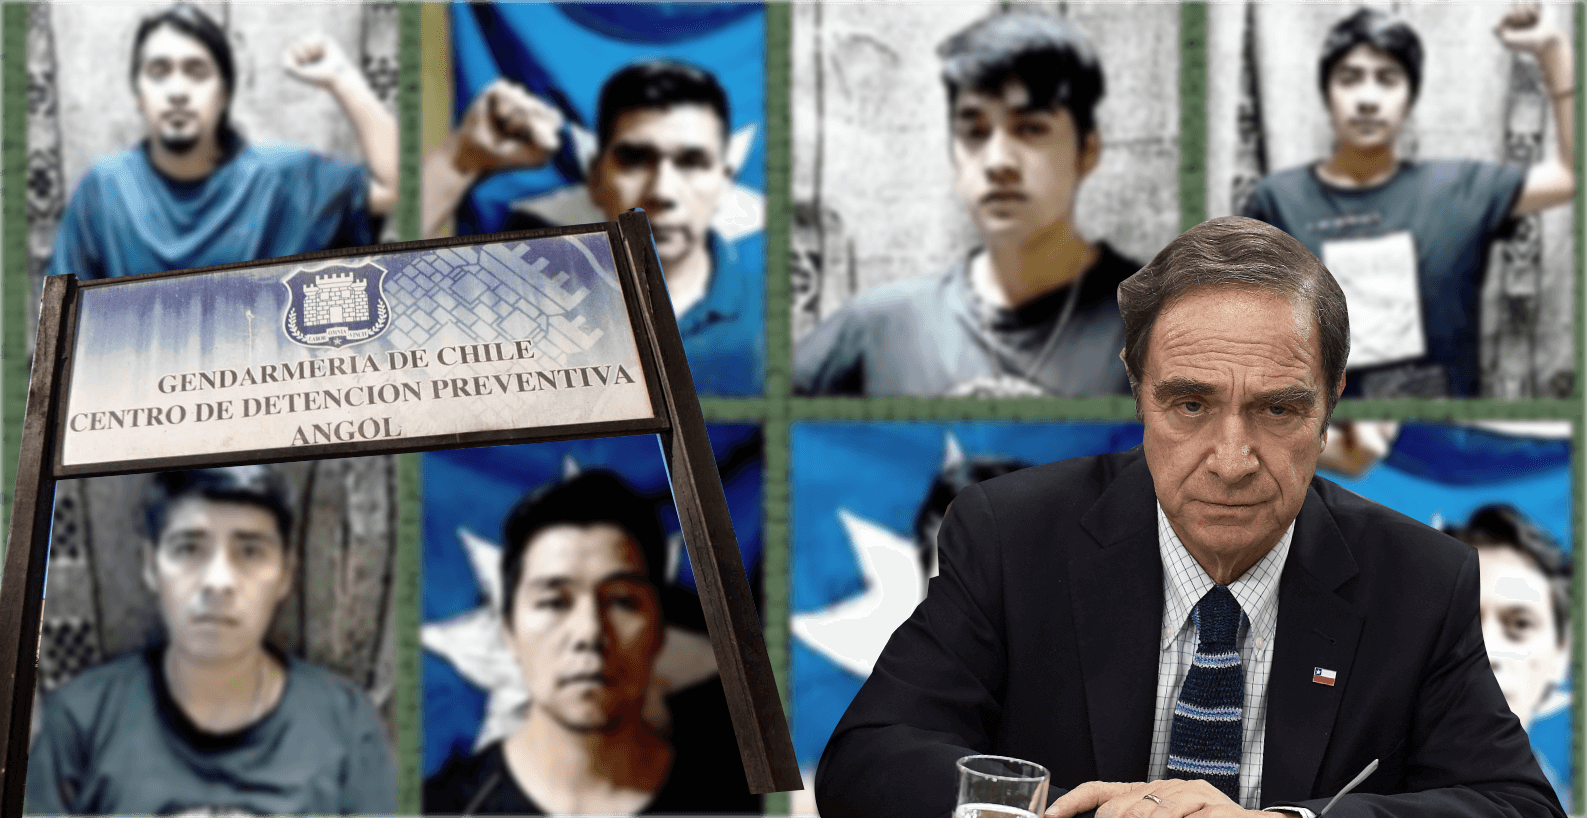 Presos Políticos Mapuche de Angol inician huelga seca